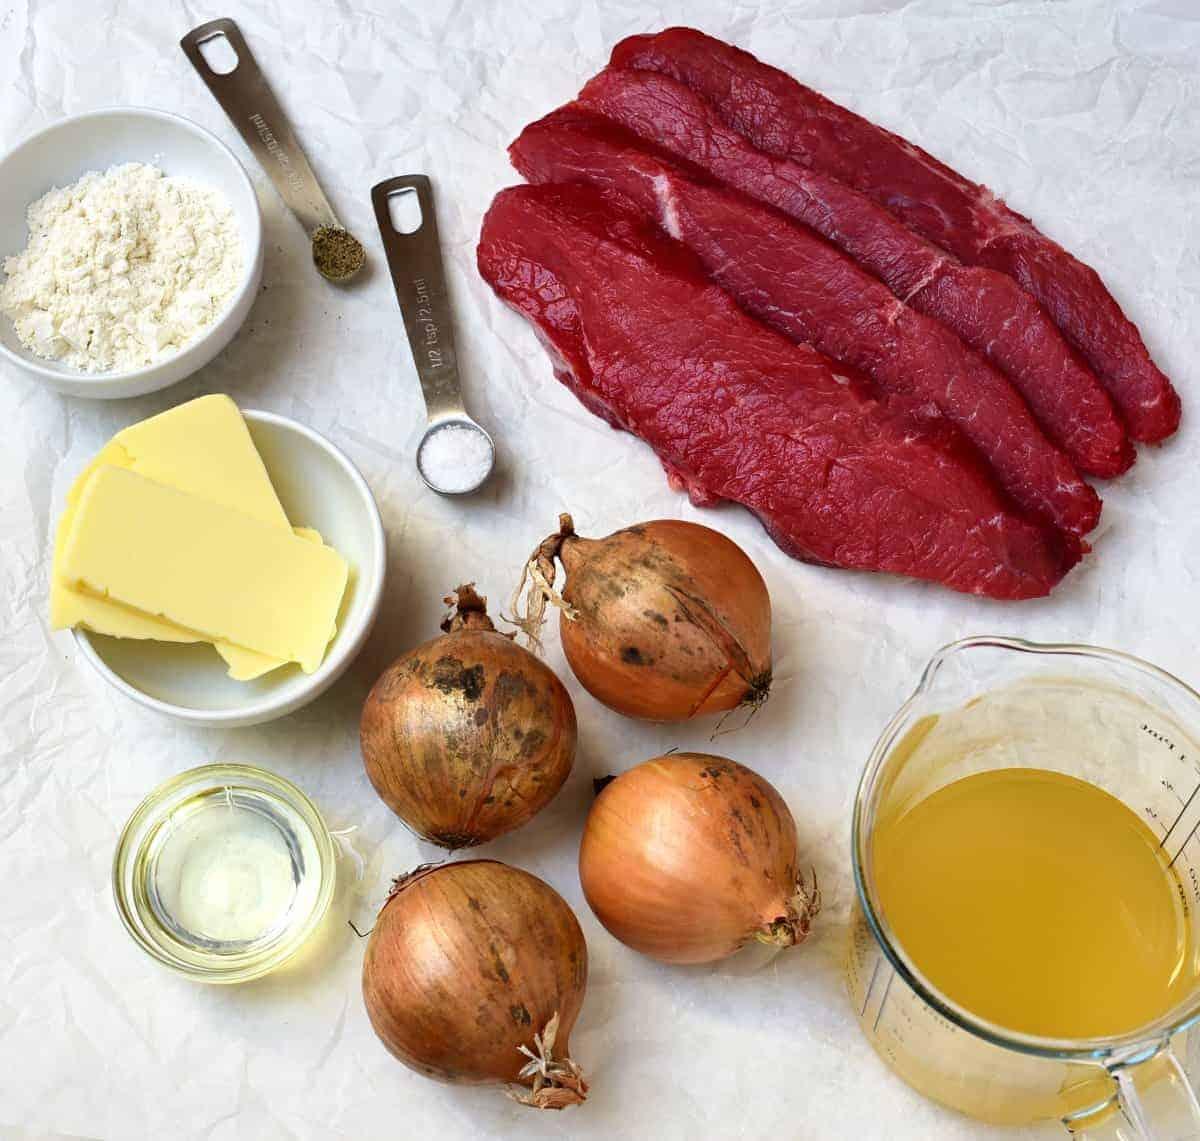 Zwiebelrostbraten ingredients